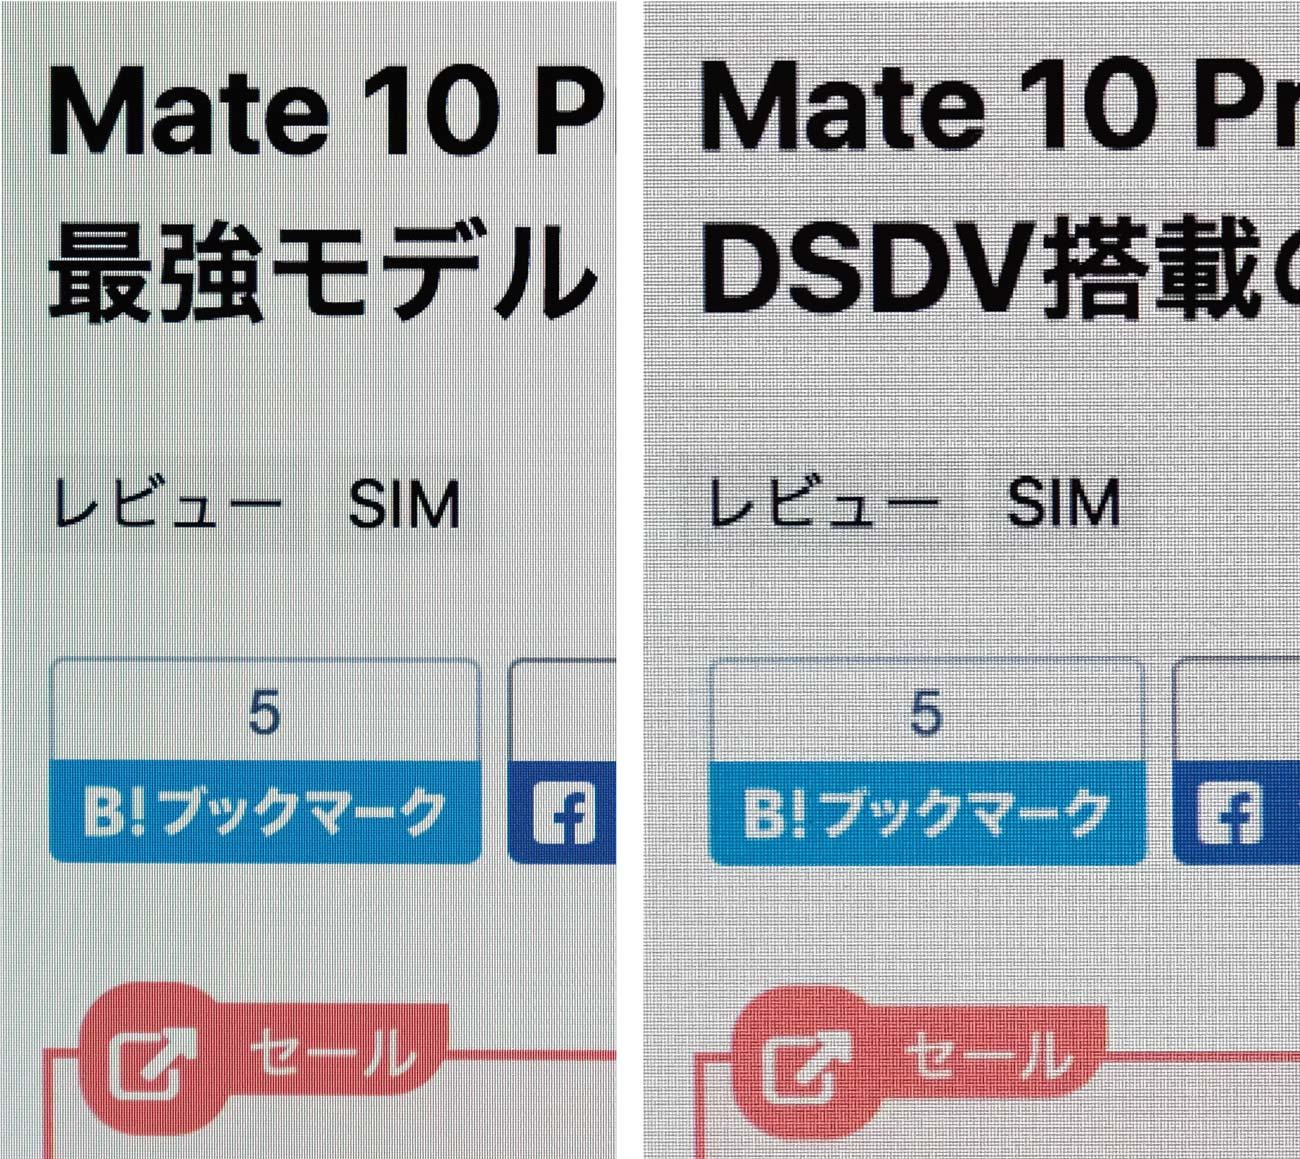 5Kディスプレイと4Kディスプレイの解像度比較